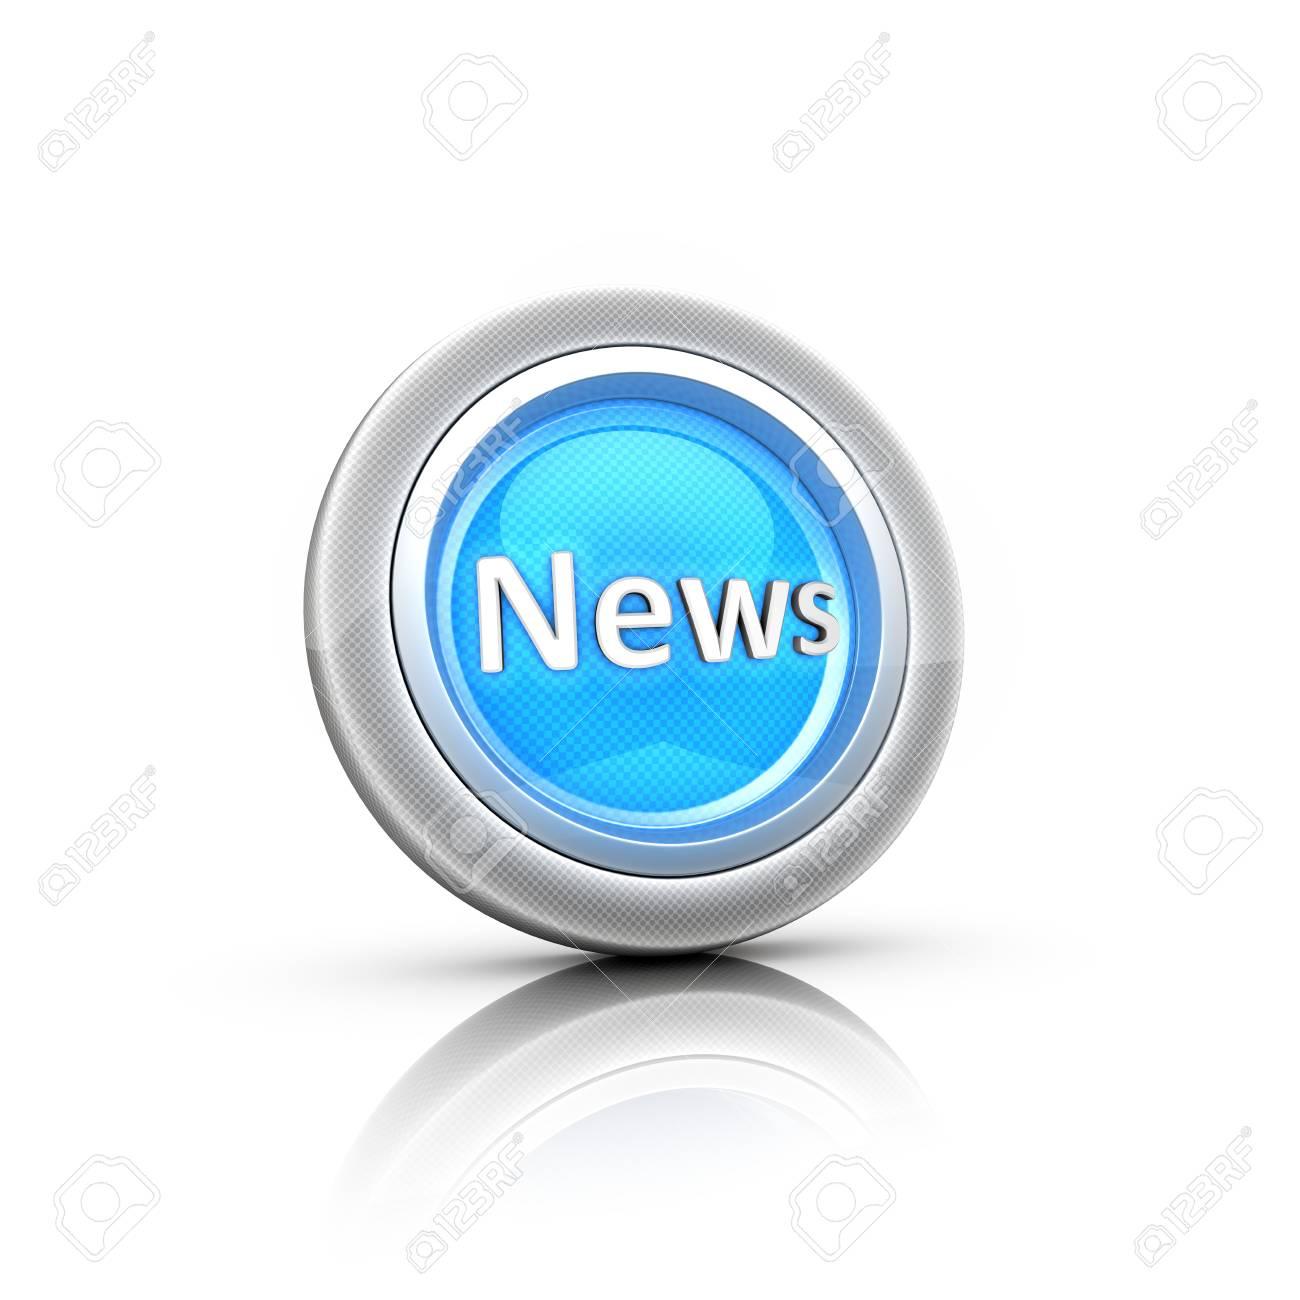 News Button Stock Photo - 18481371